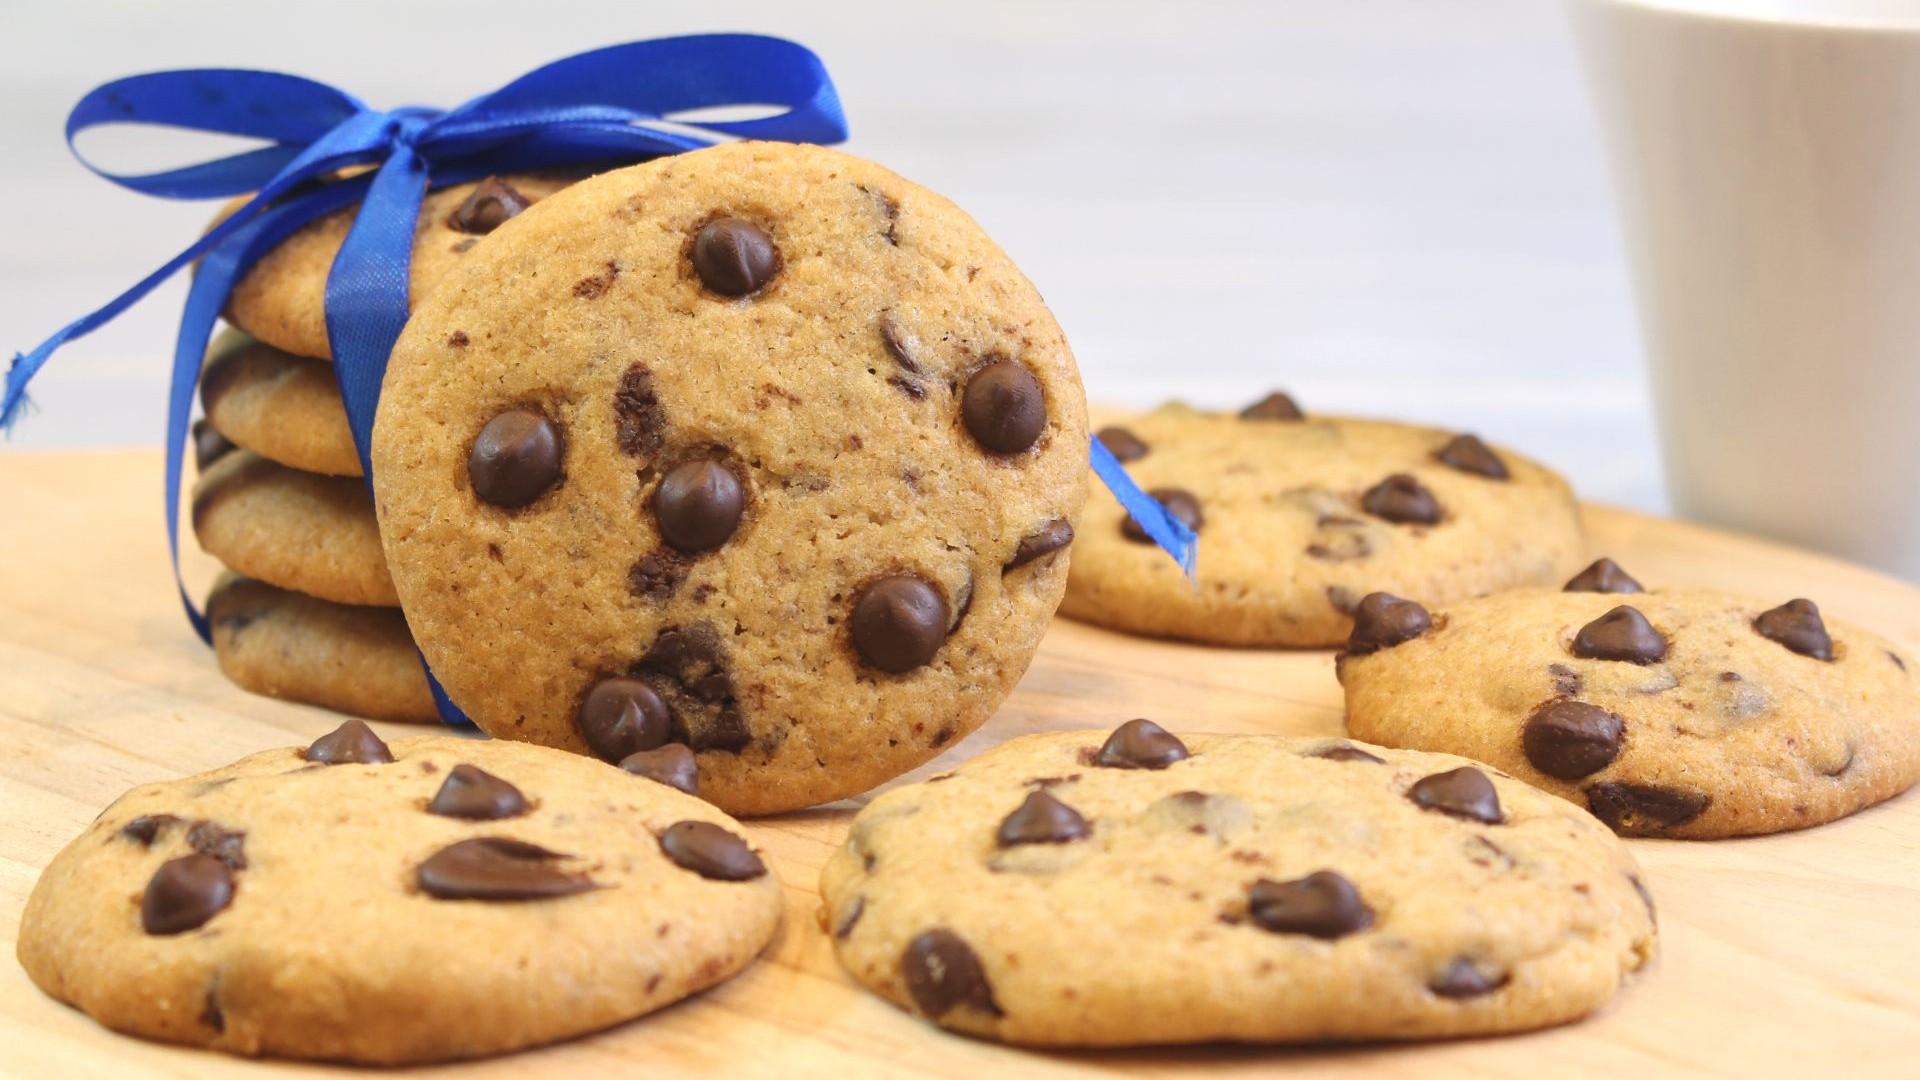 masa de galletas con trozos de chocolate